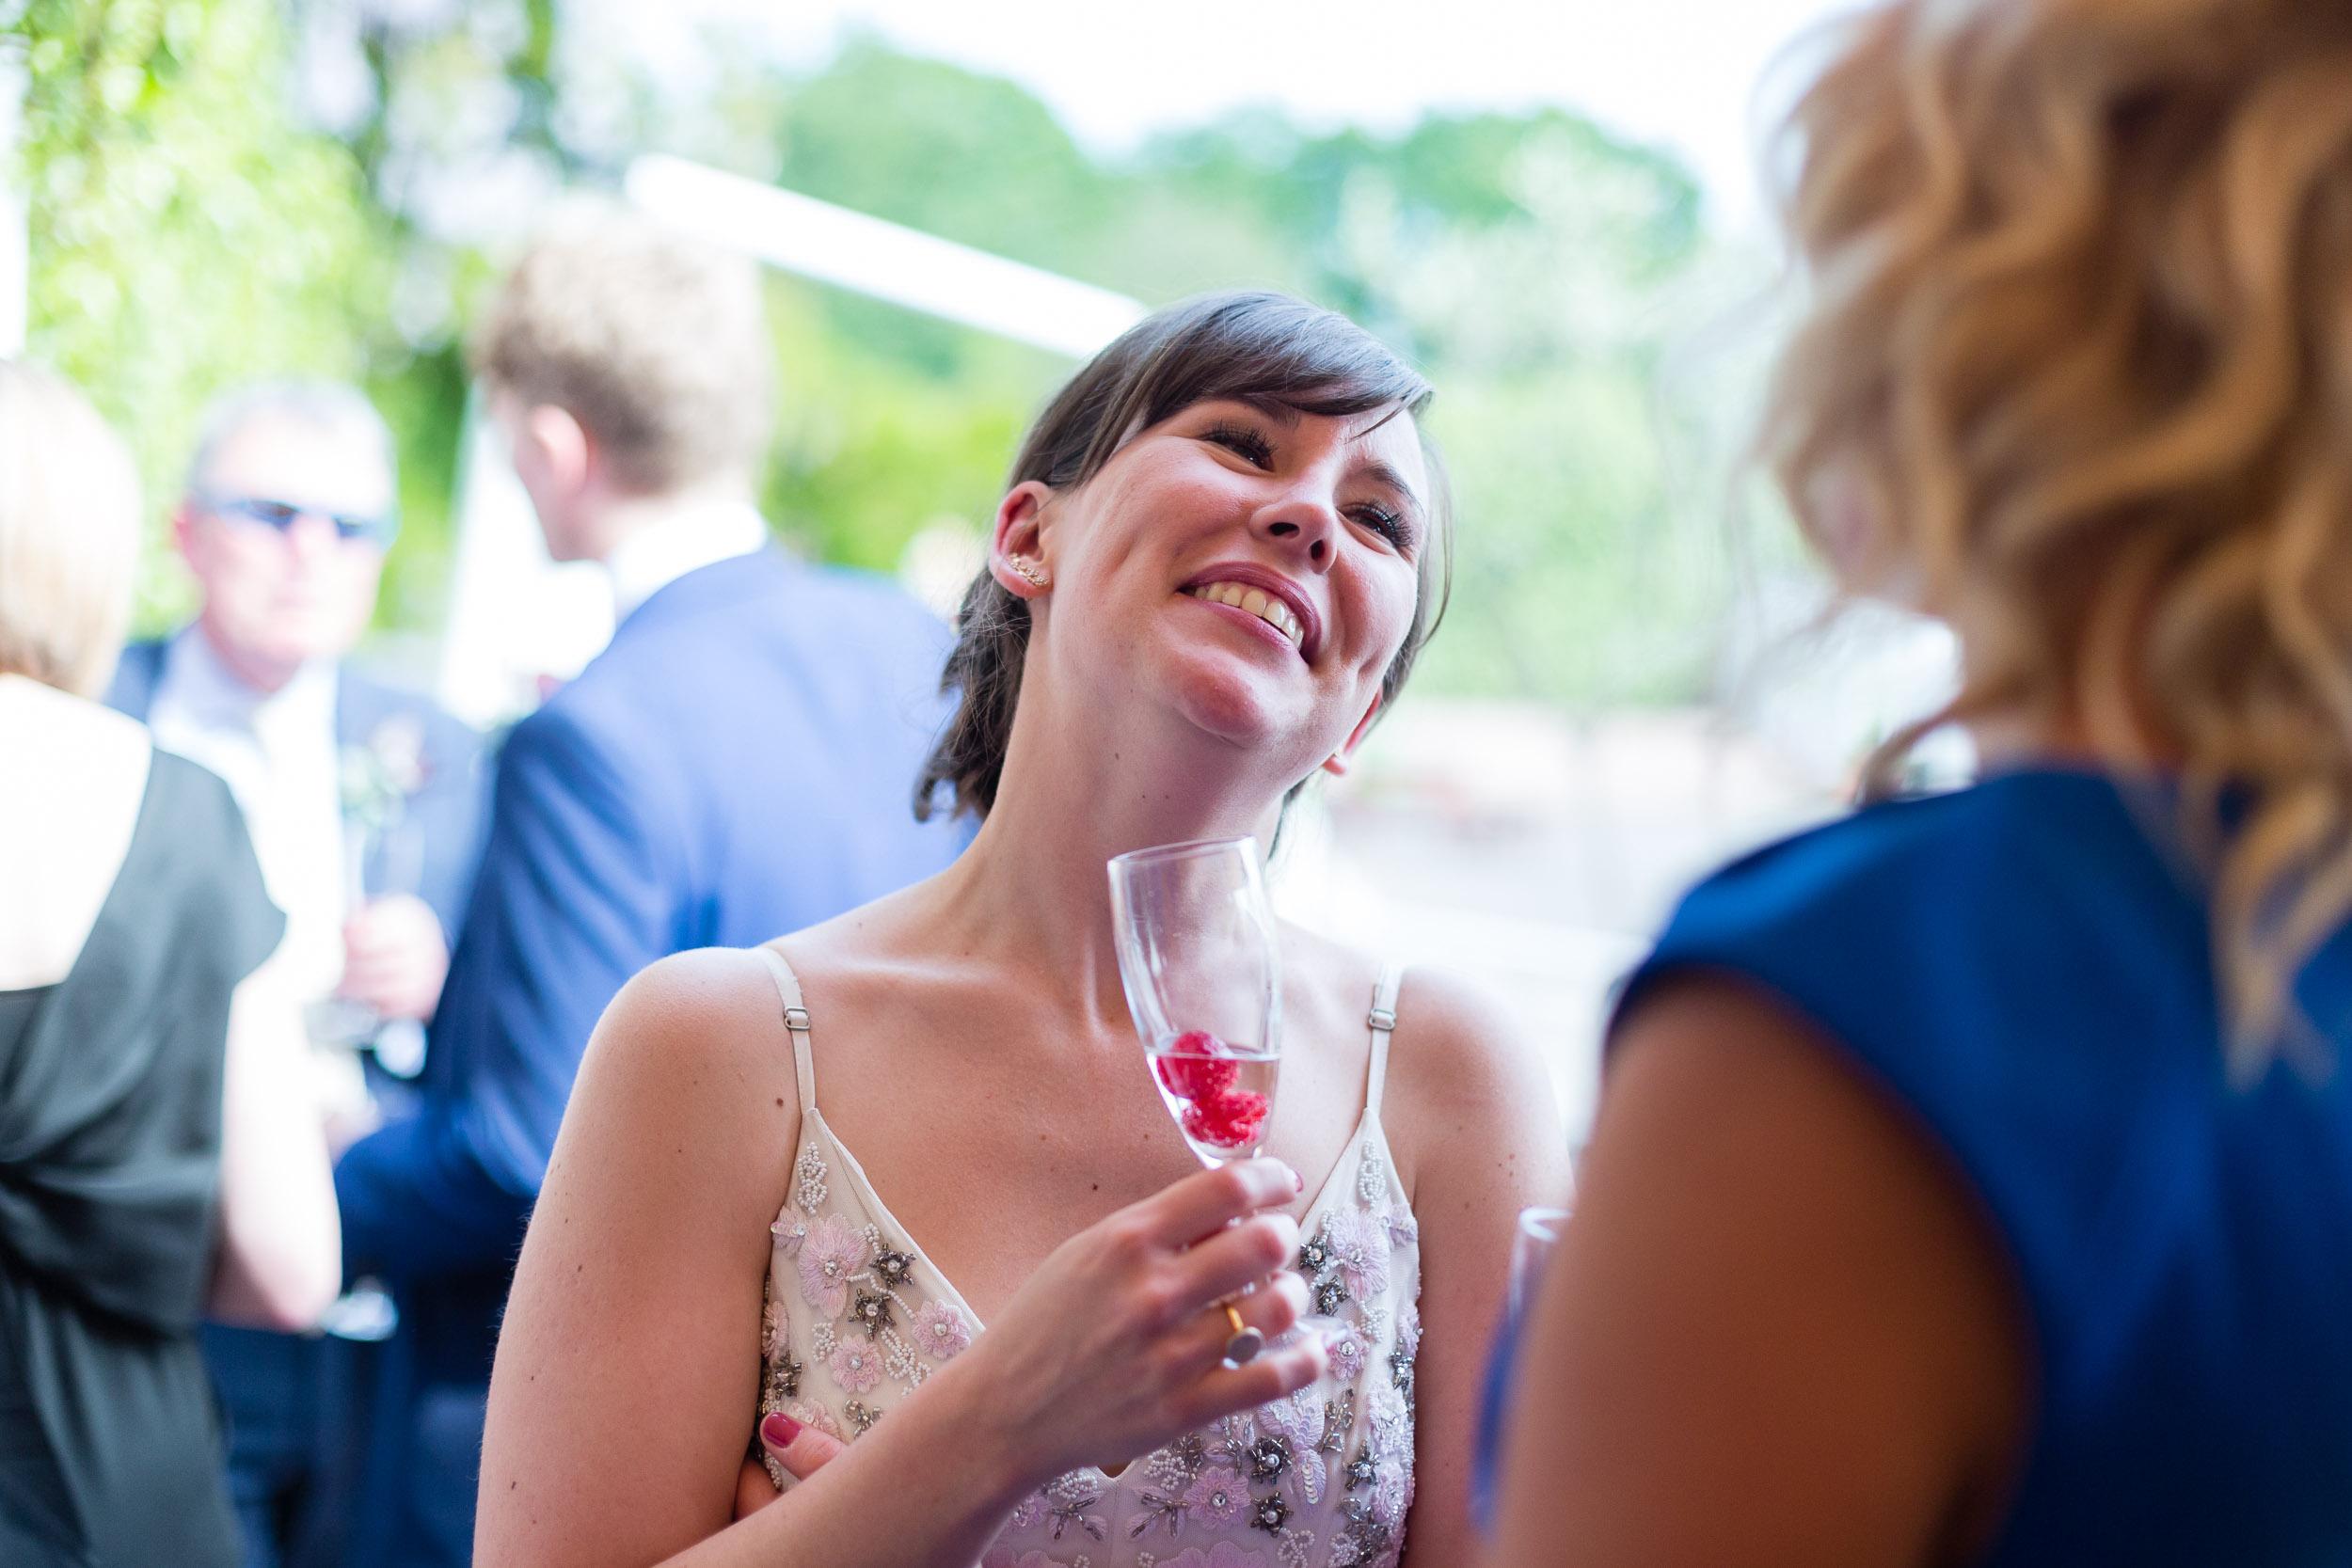 brockwell-lido-brixton-herne-hill-wedding-236.jpg